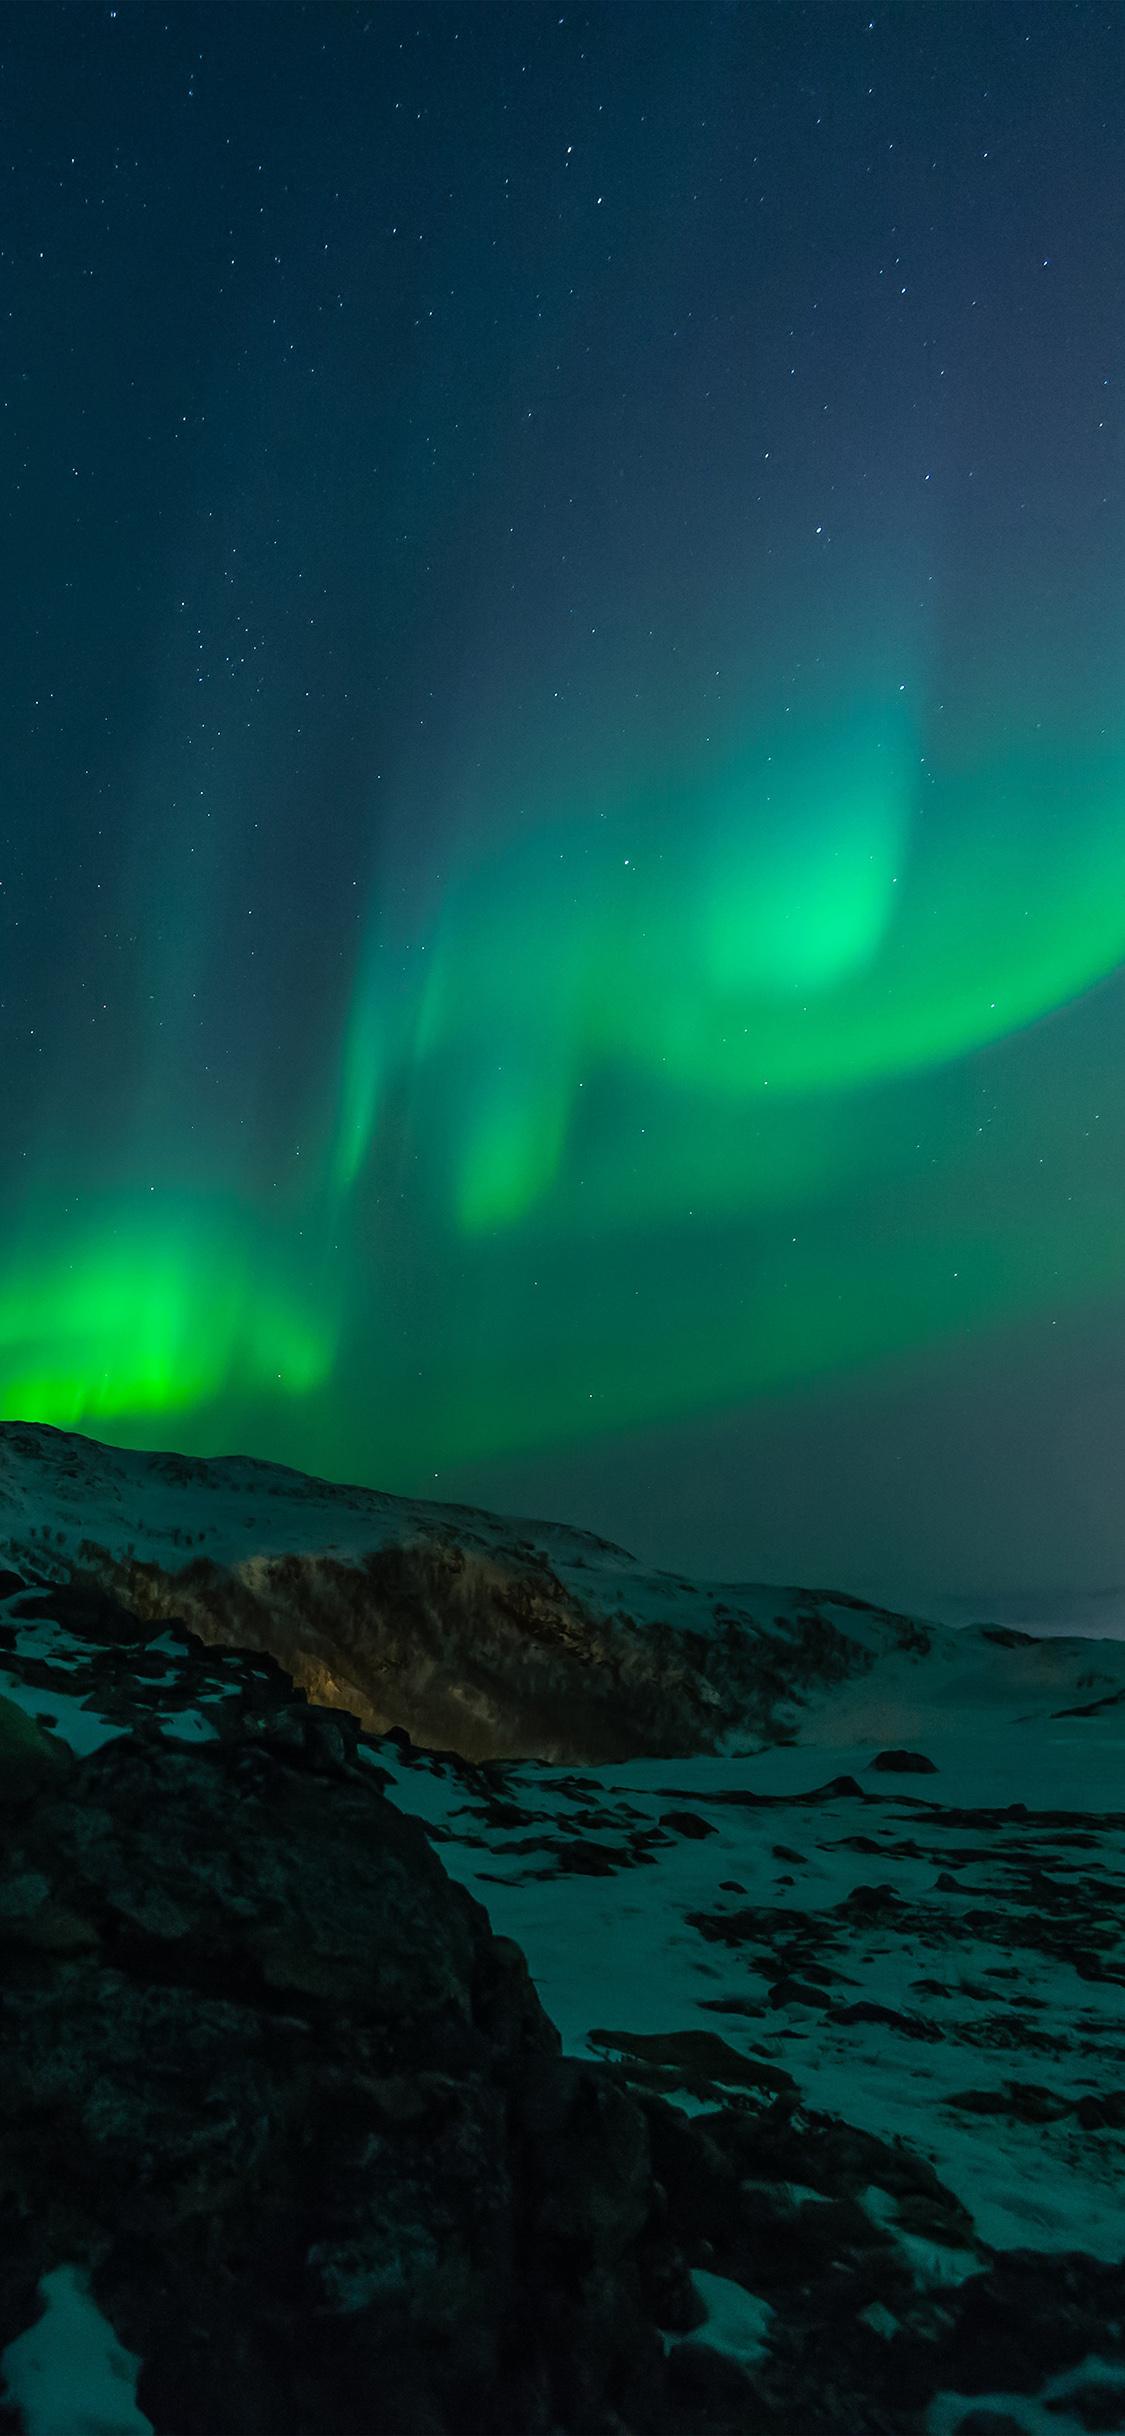 Iphonexpapers Com Iphone X Wallpaper Mz83 Aurora Nature Night Sky